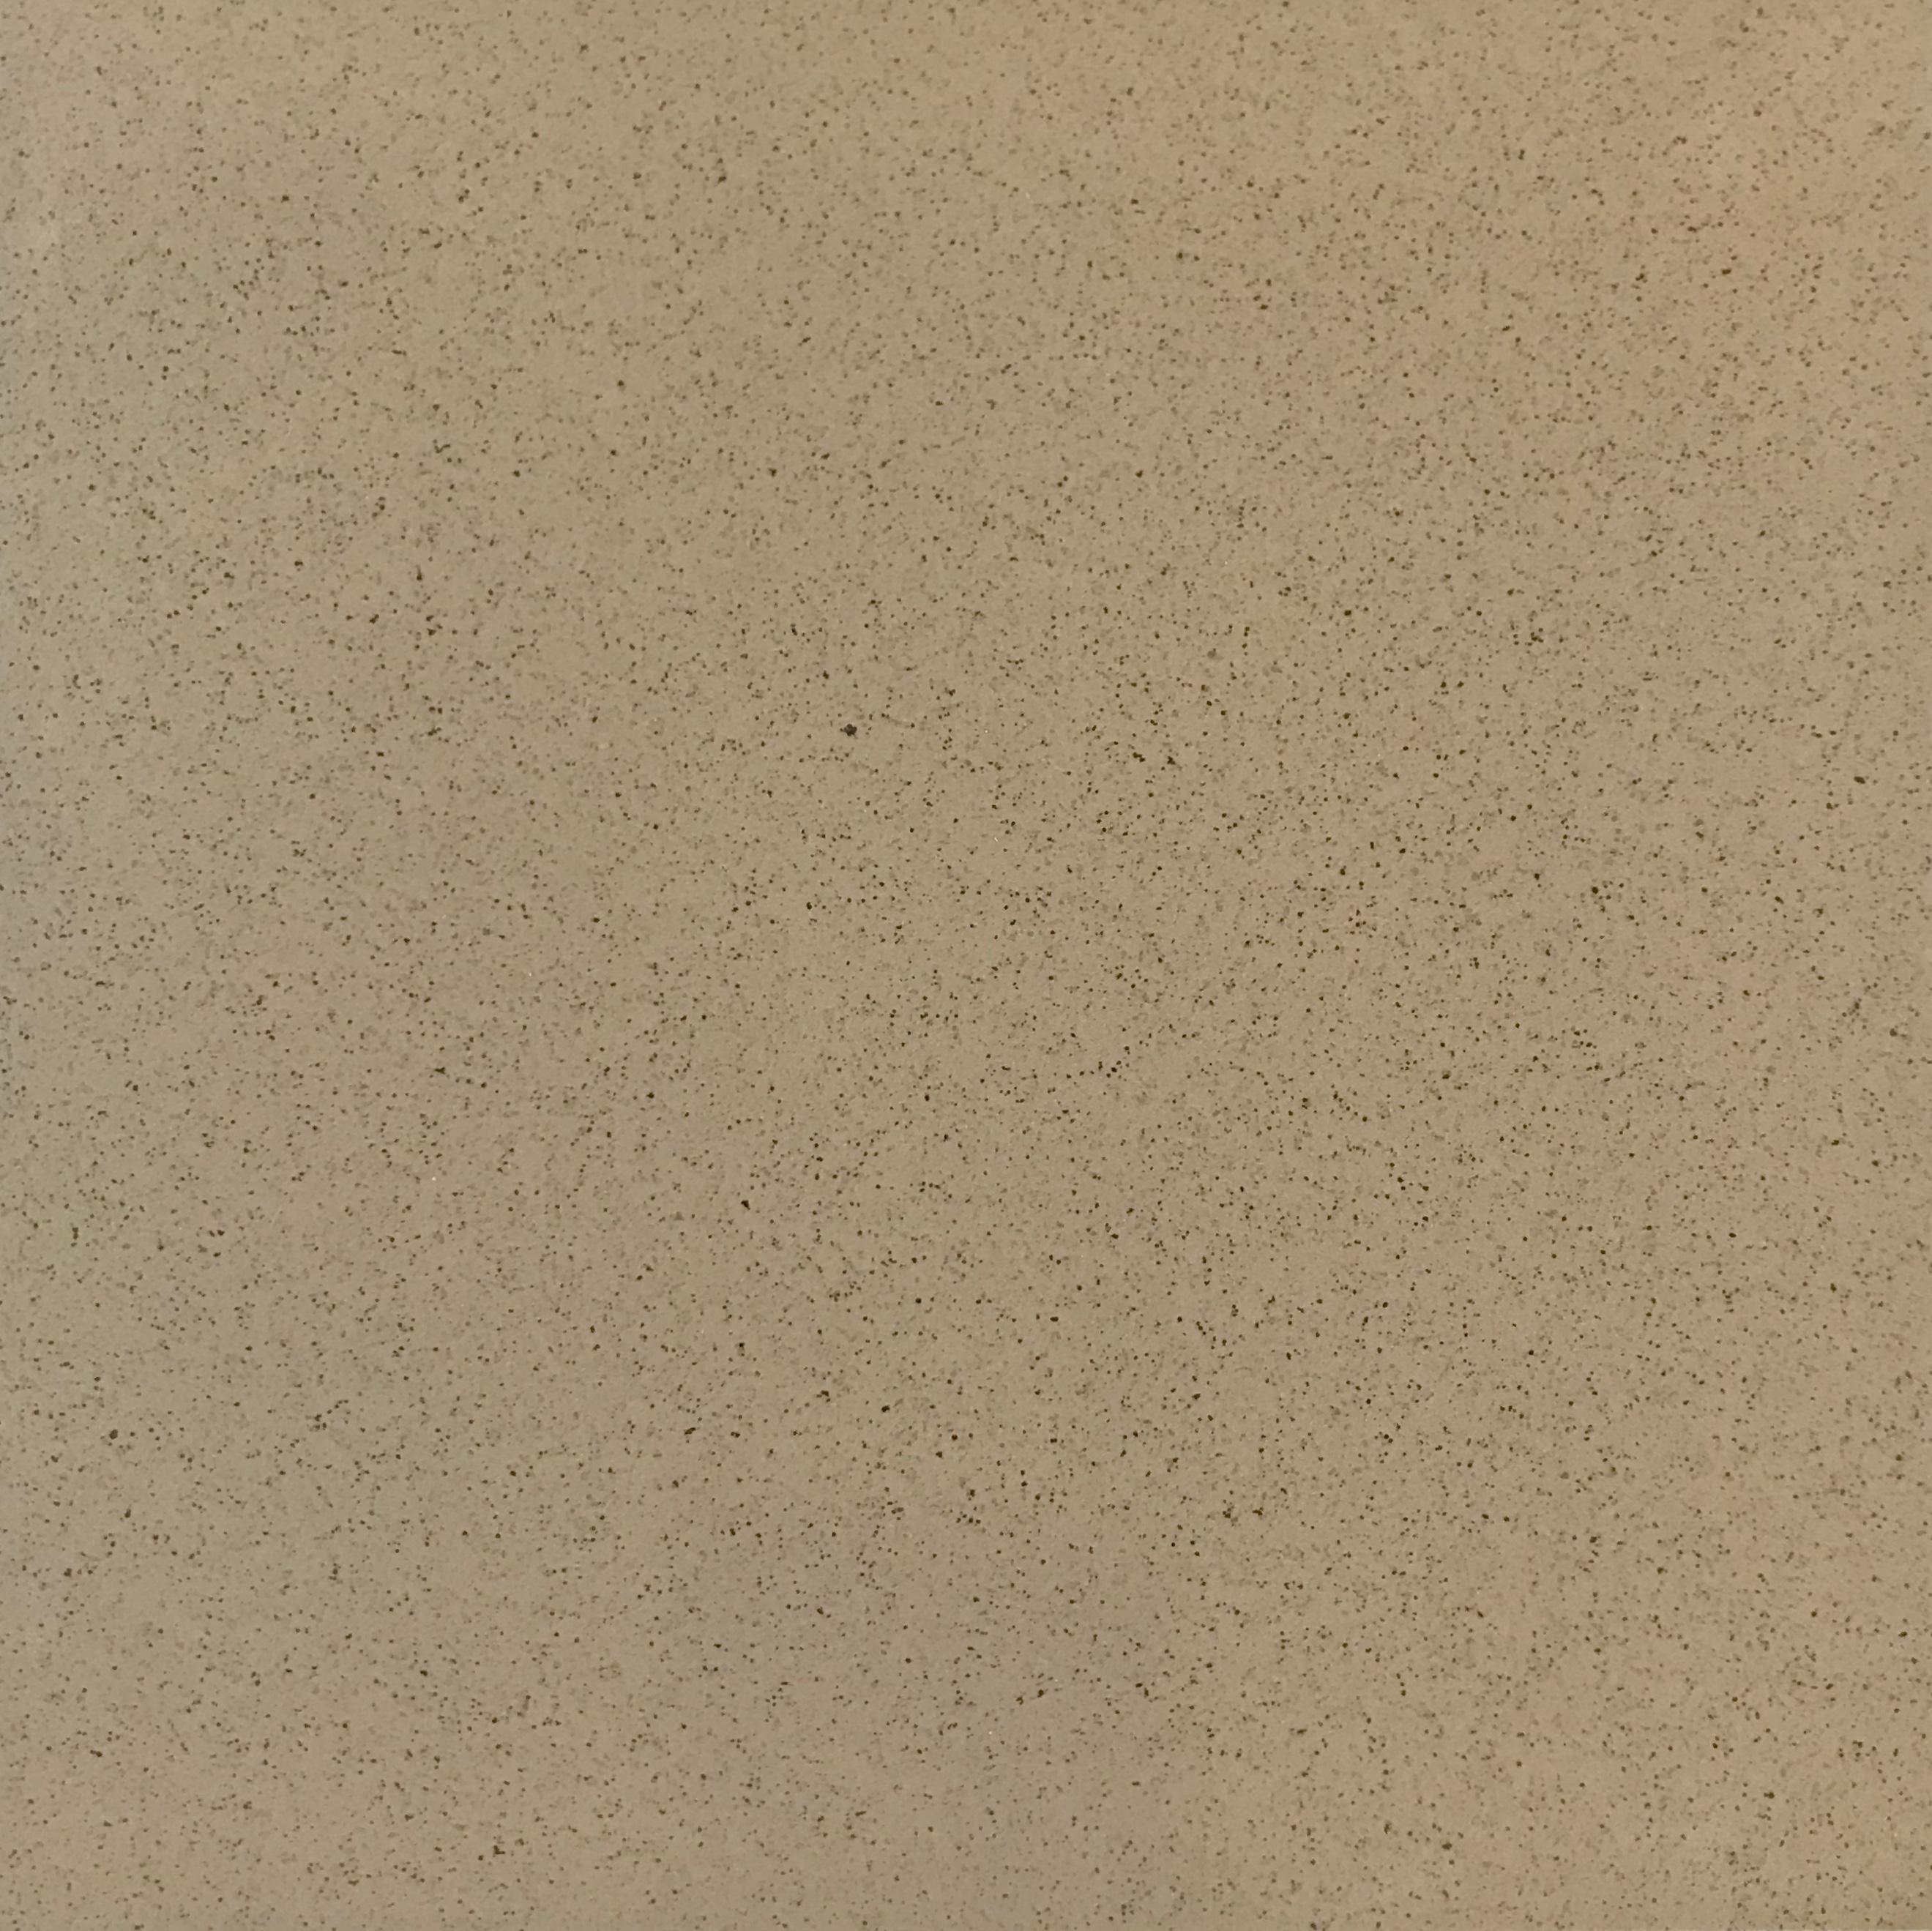 Meissen Pandora matt Boden-/Wandfliese Mont Blanc Creme 30x30